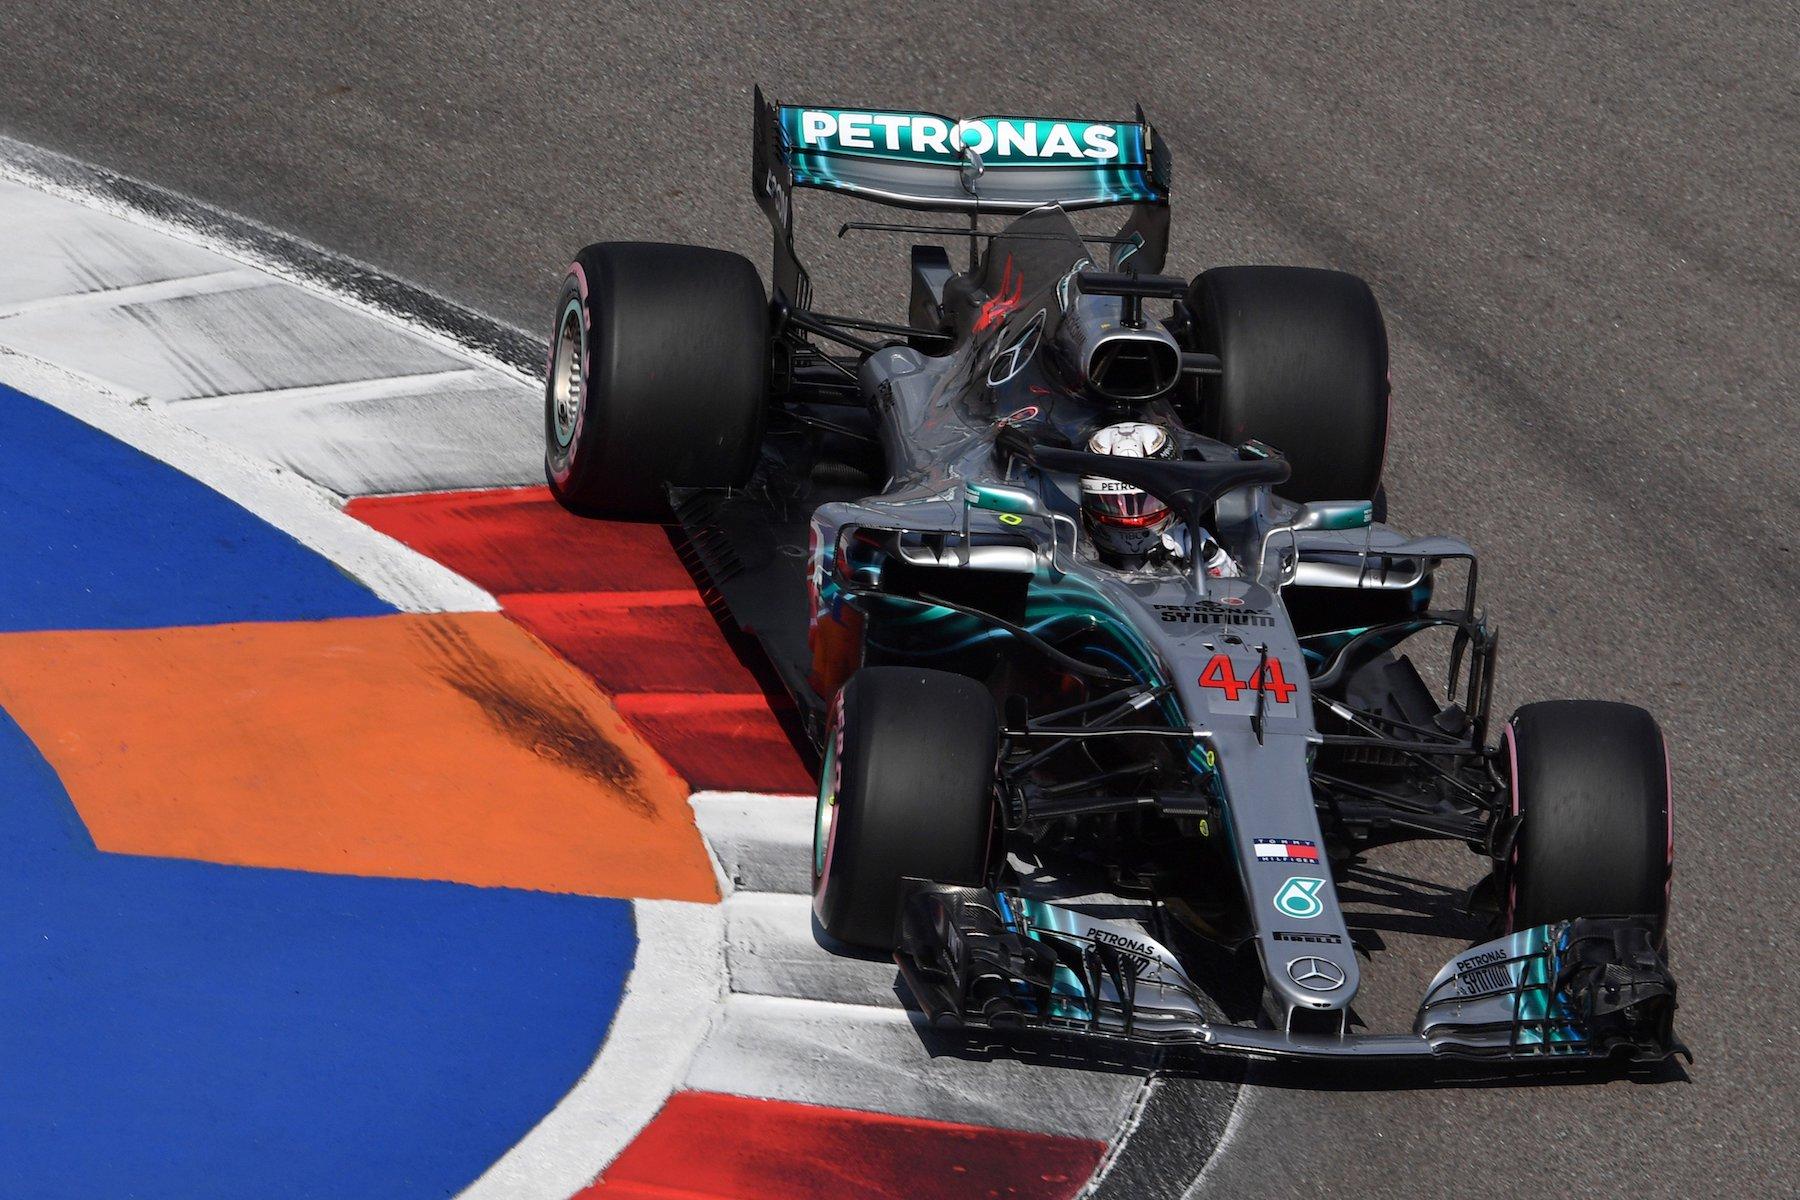 2018 Lewis Hamilton | Mercedes W09 | 2018 Russian GP FP3 6 copy.jpg